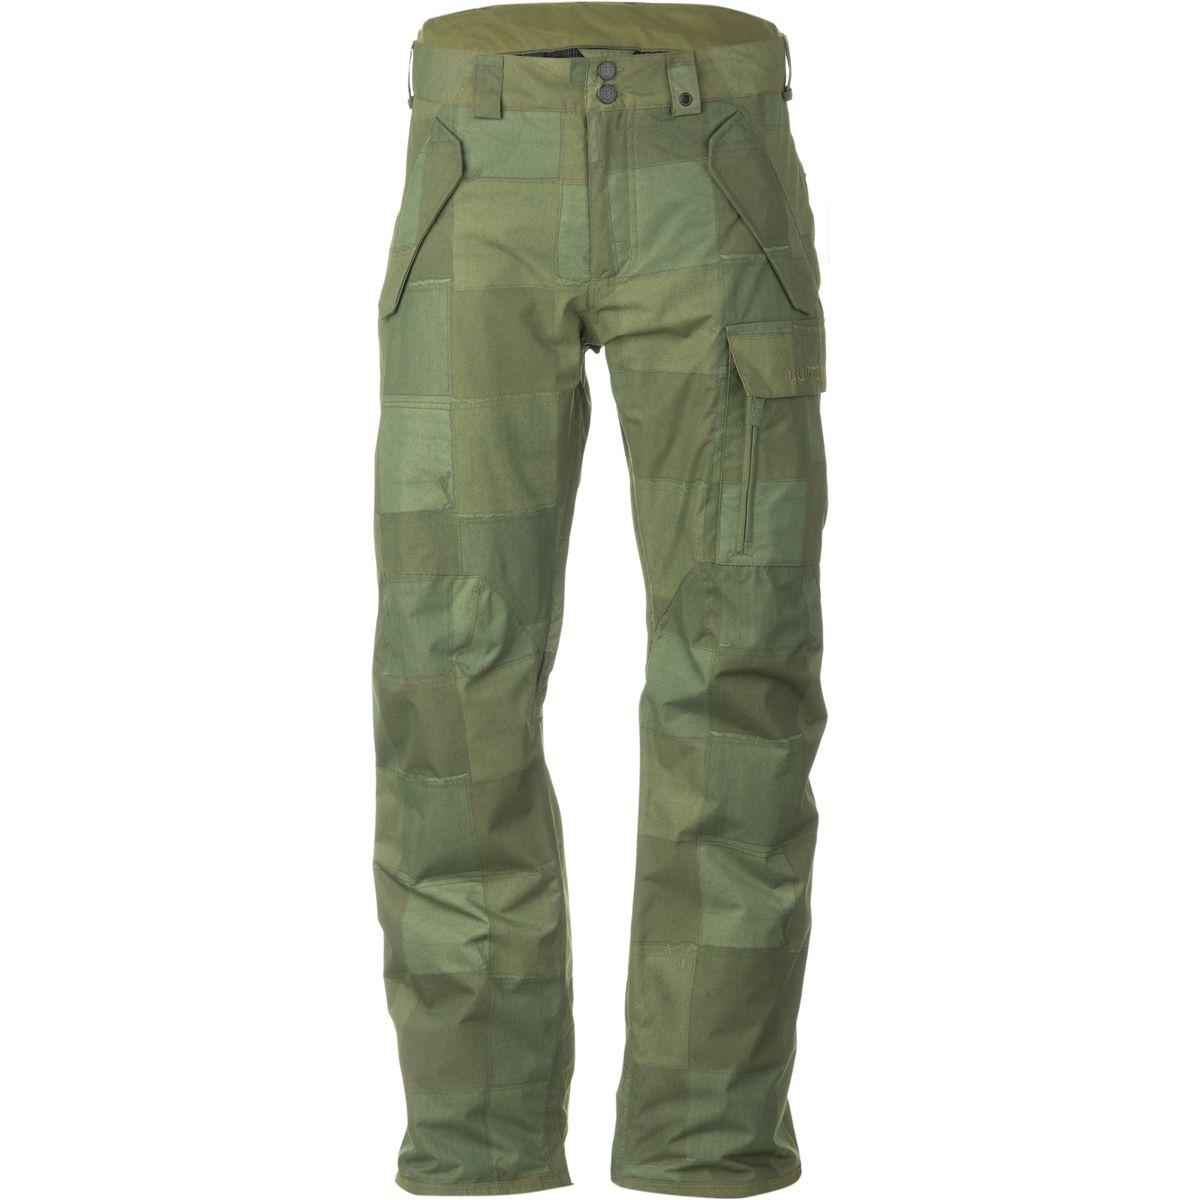 Burton Covert Insulated Pant - Men